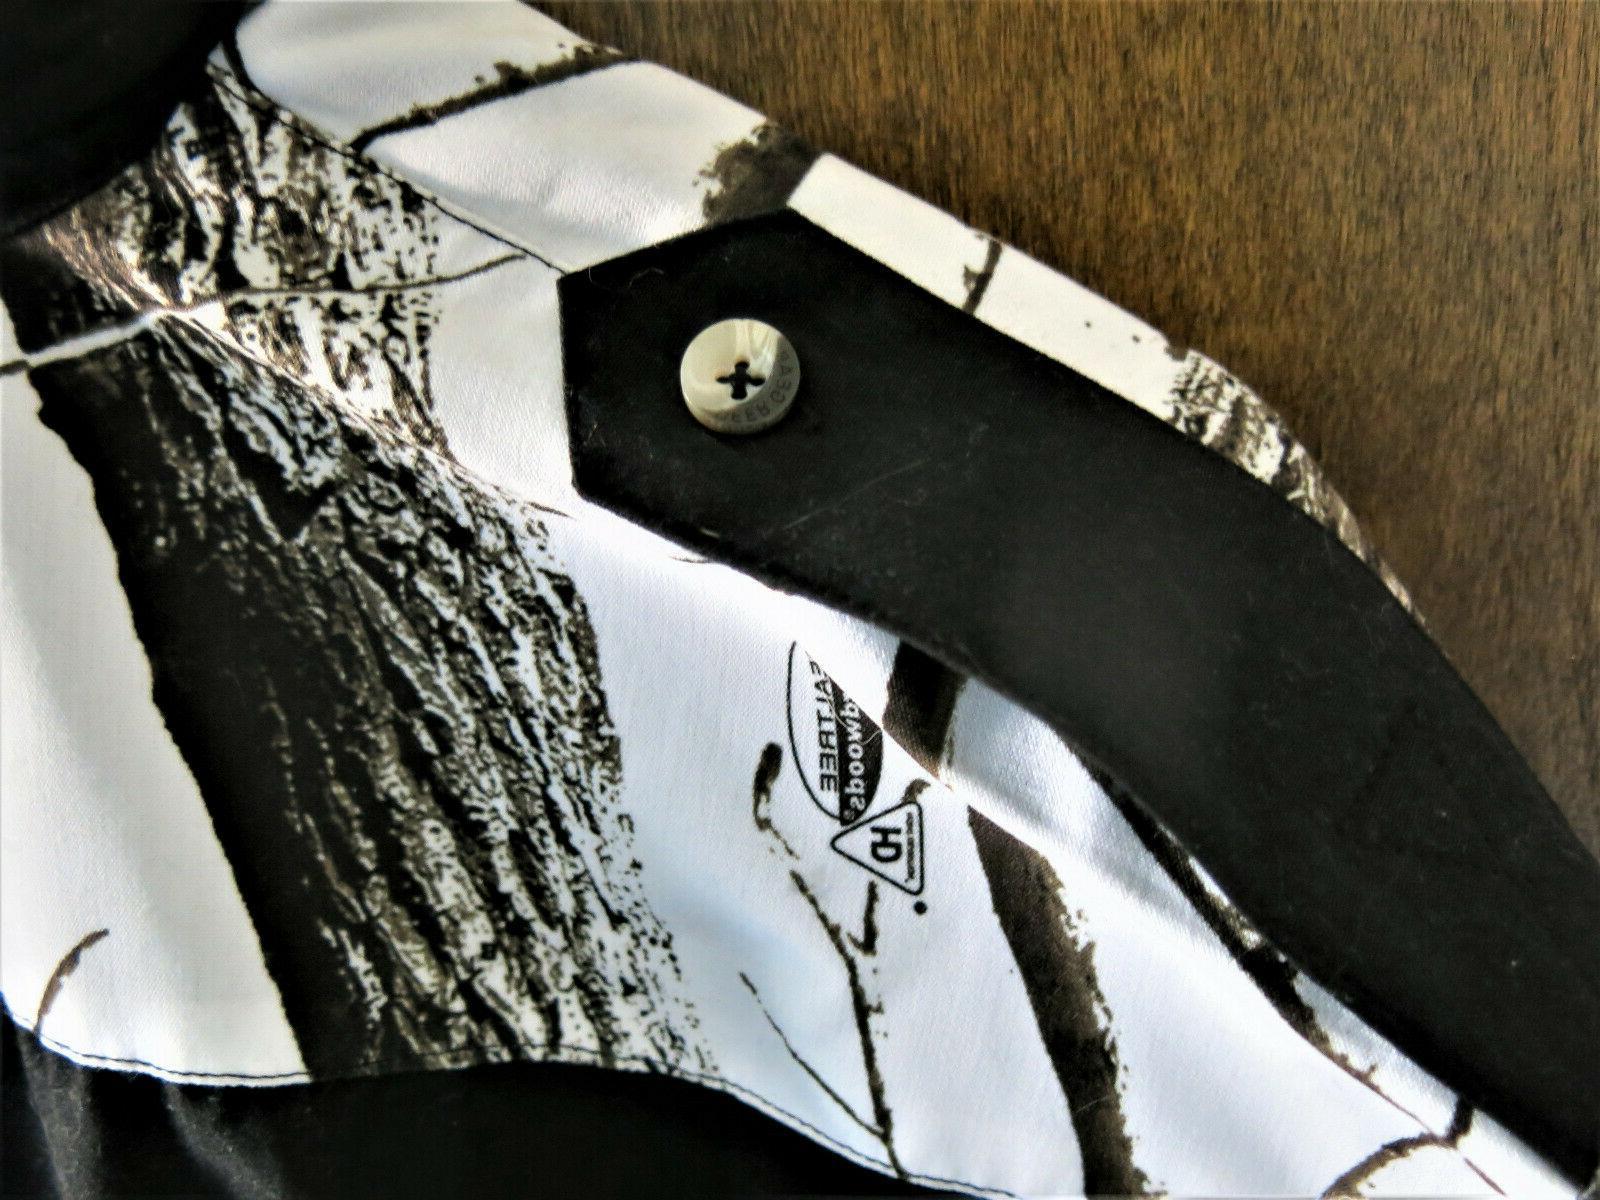 Legendary Whitetails Original Gear Shirt Black